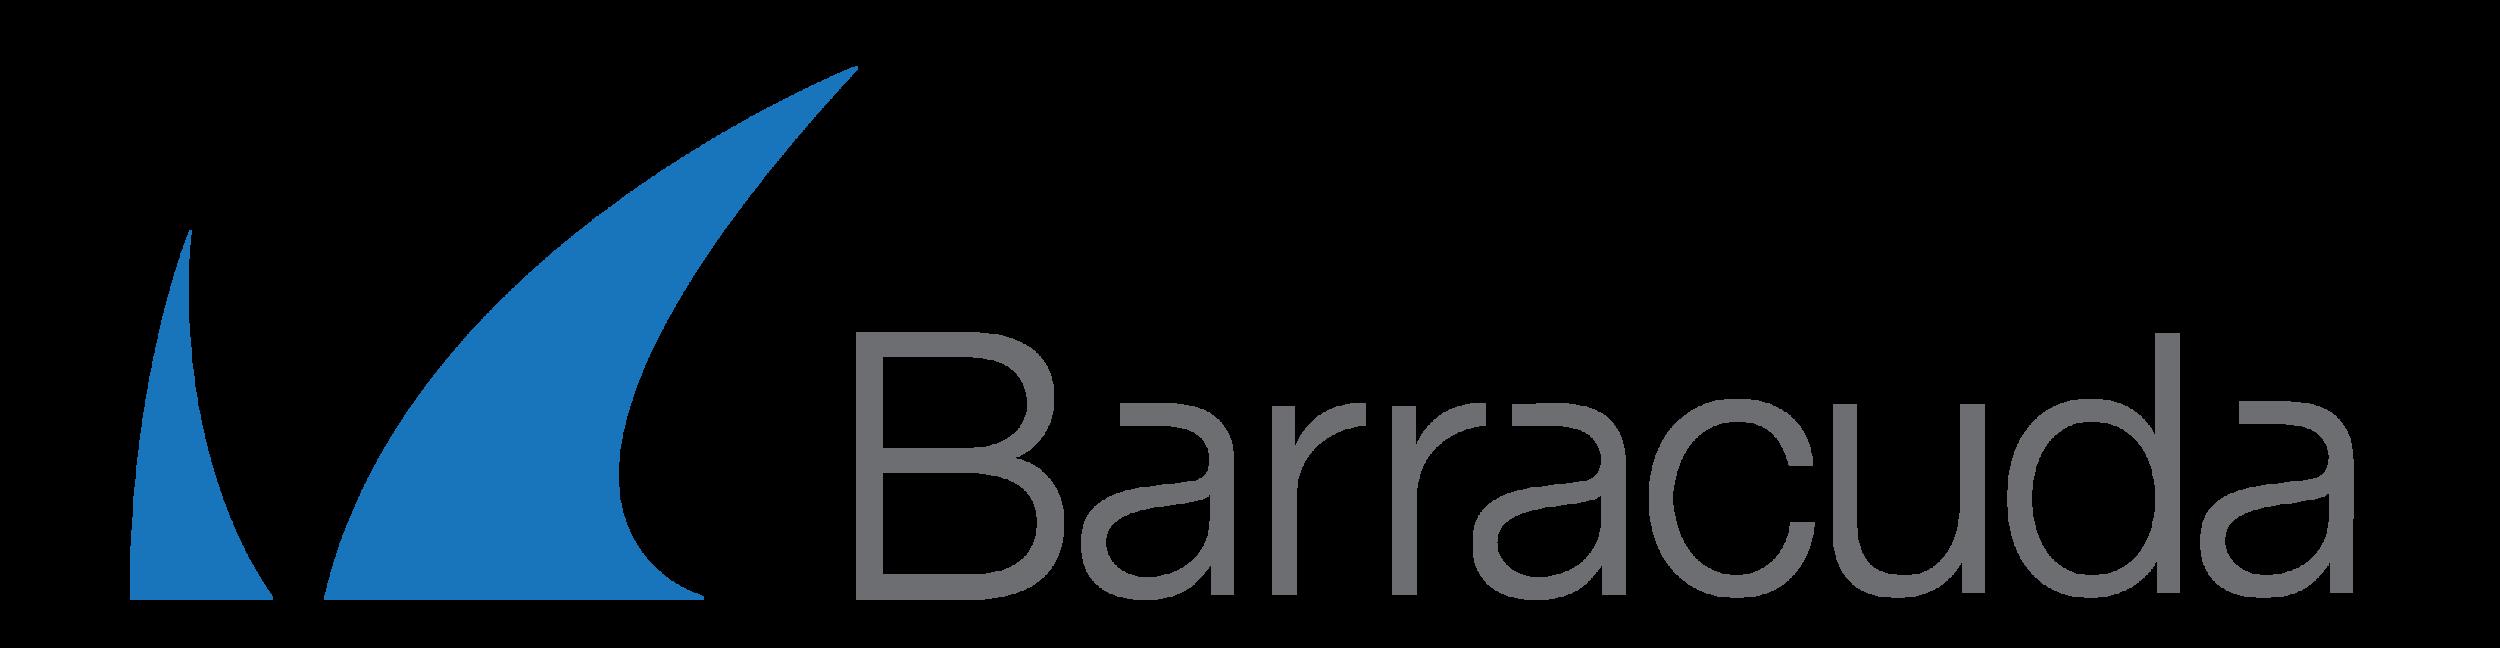 barracuda-networkslogo.png